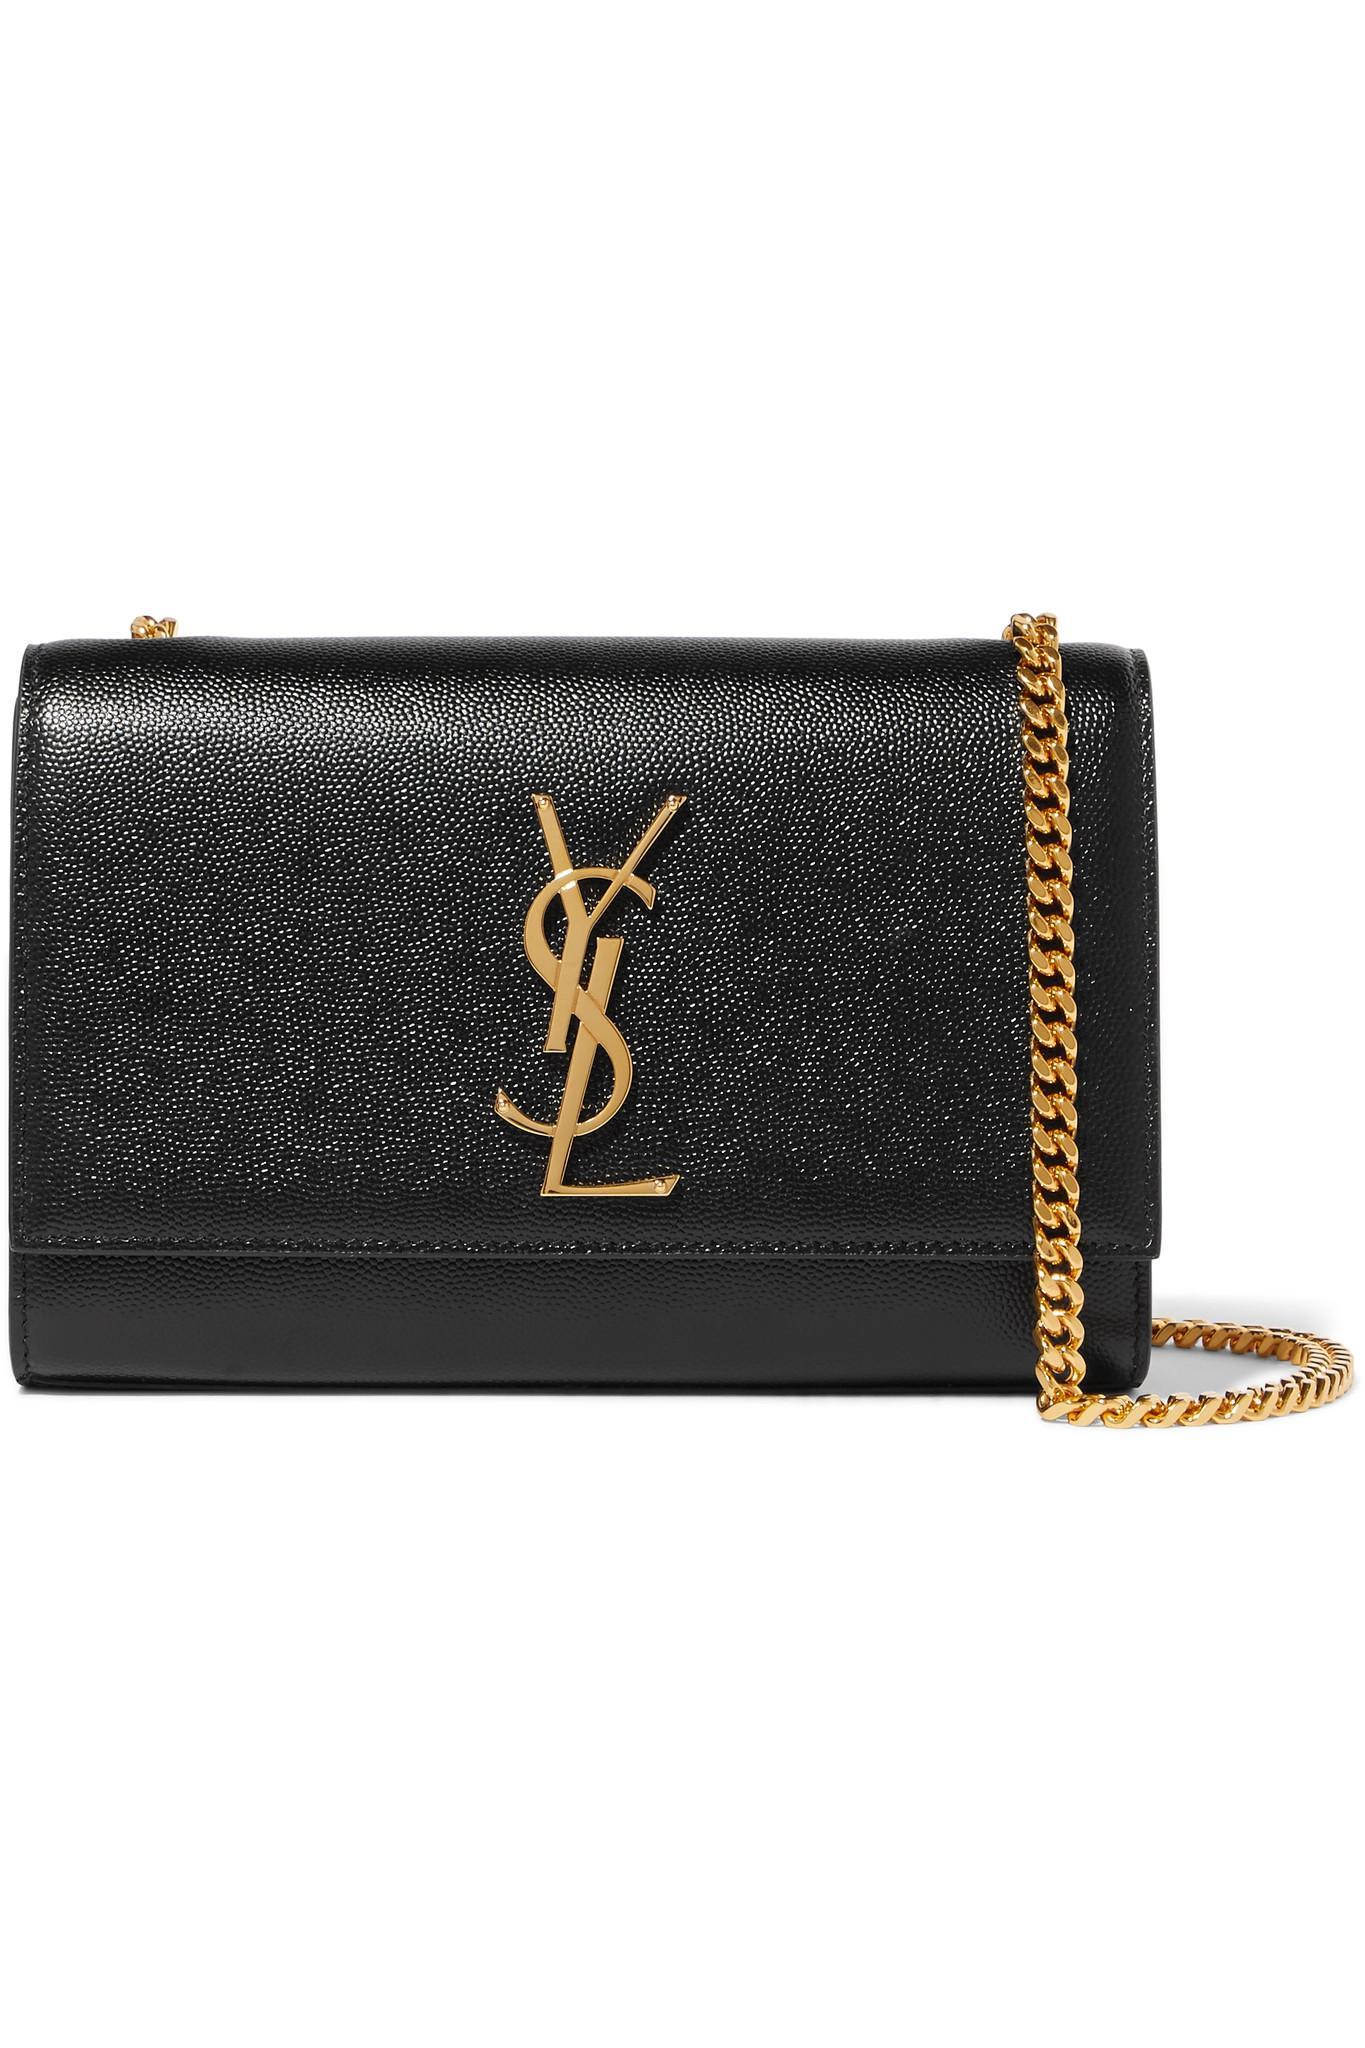 Saint Laurent. Women s Black Monogramme Kate Small Textured-leather  Shoulder Bag 6362832e8b9be